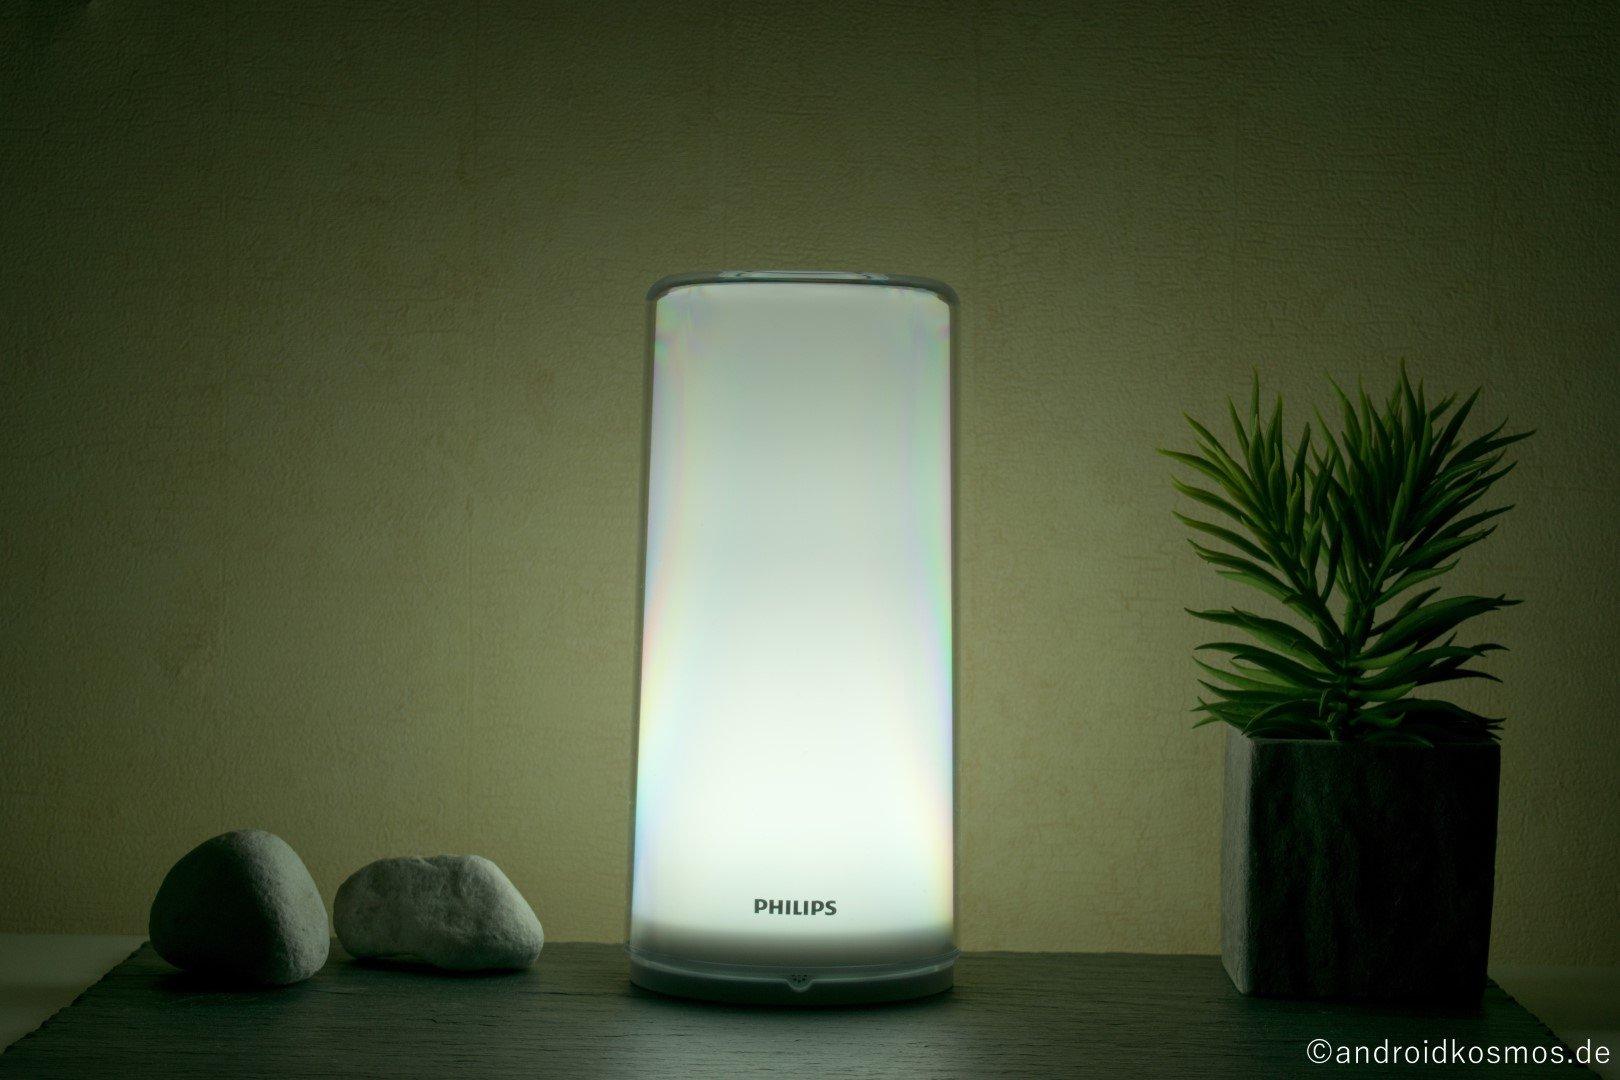 Philips Zhirui AndroidKosmos.de 3662